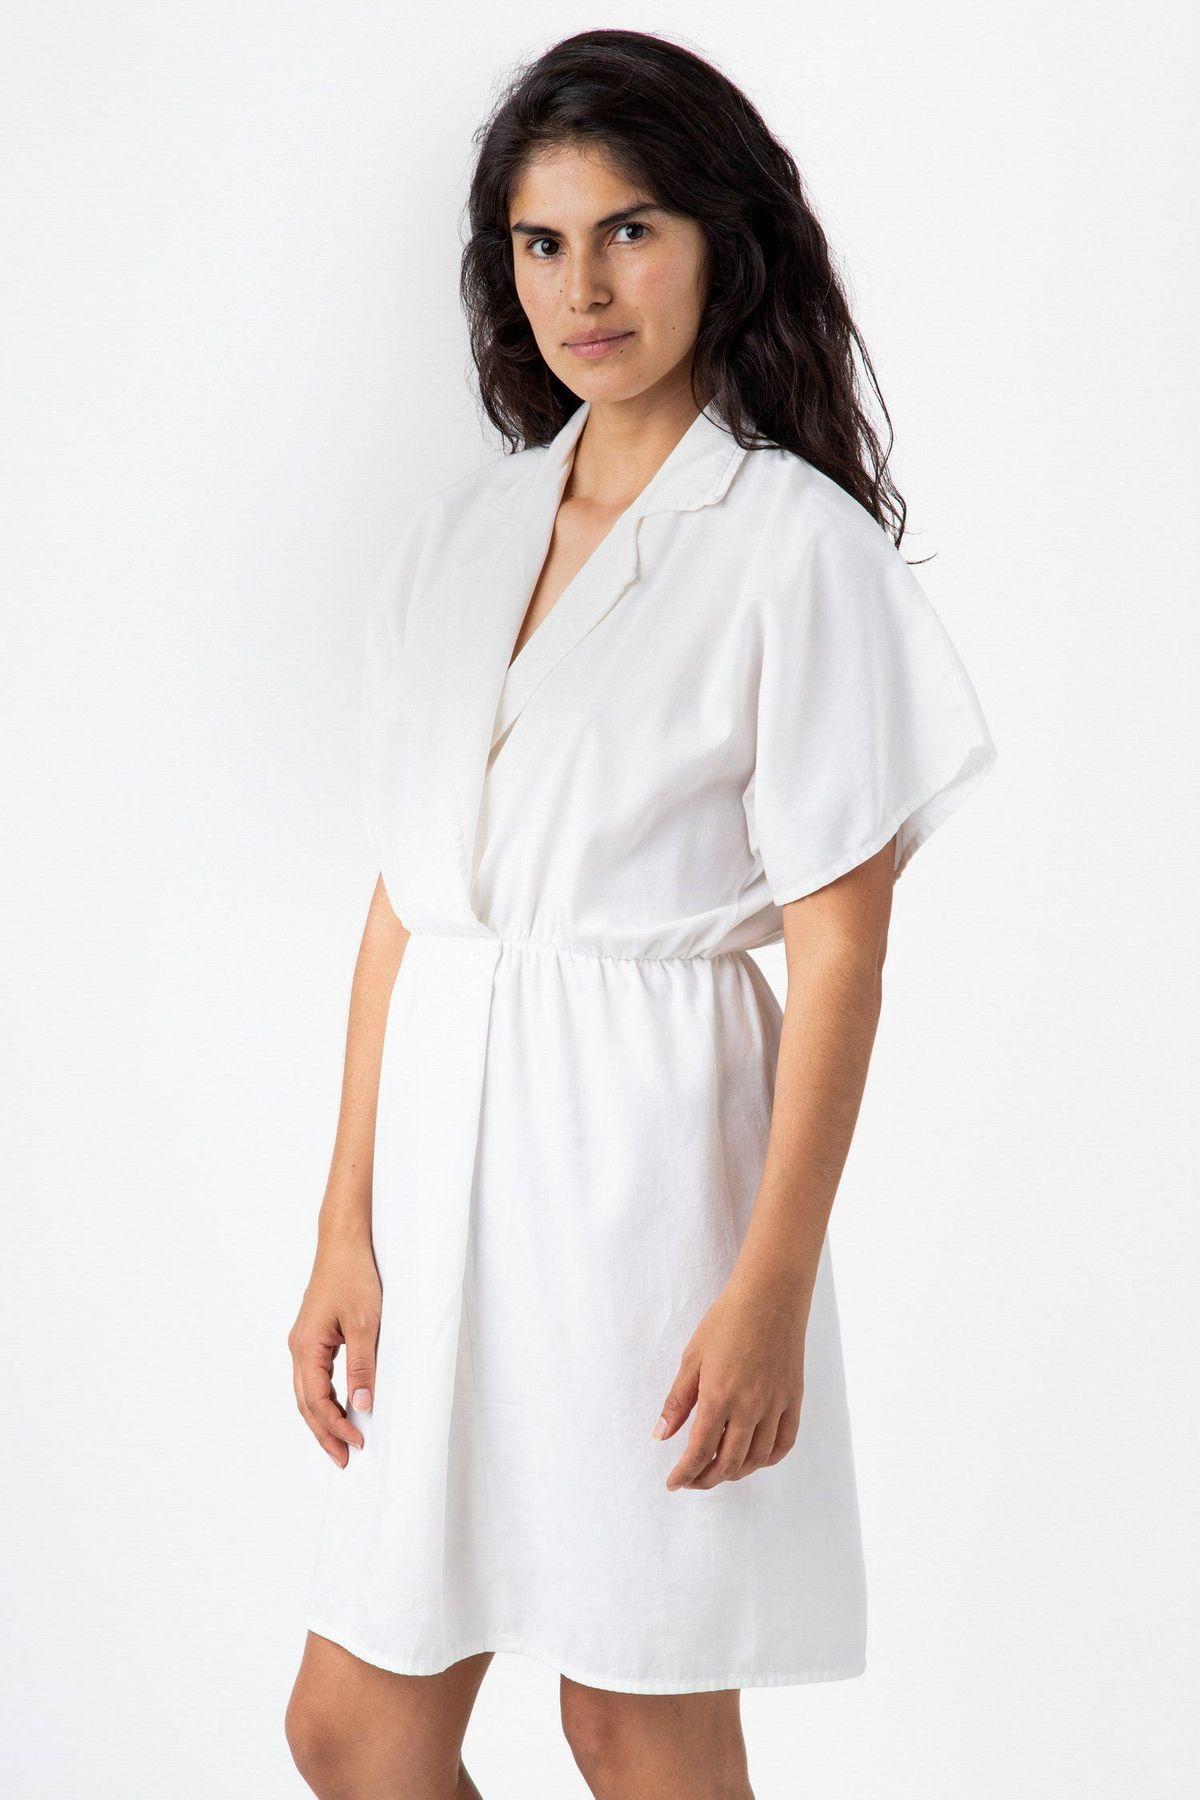 White Dress Made In Usa Los Angeles Apparel Fashion Minimalist Fashion Style